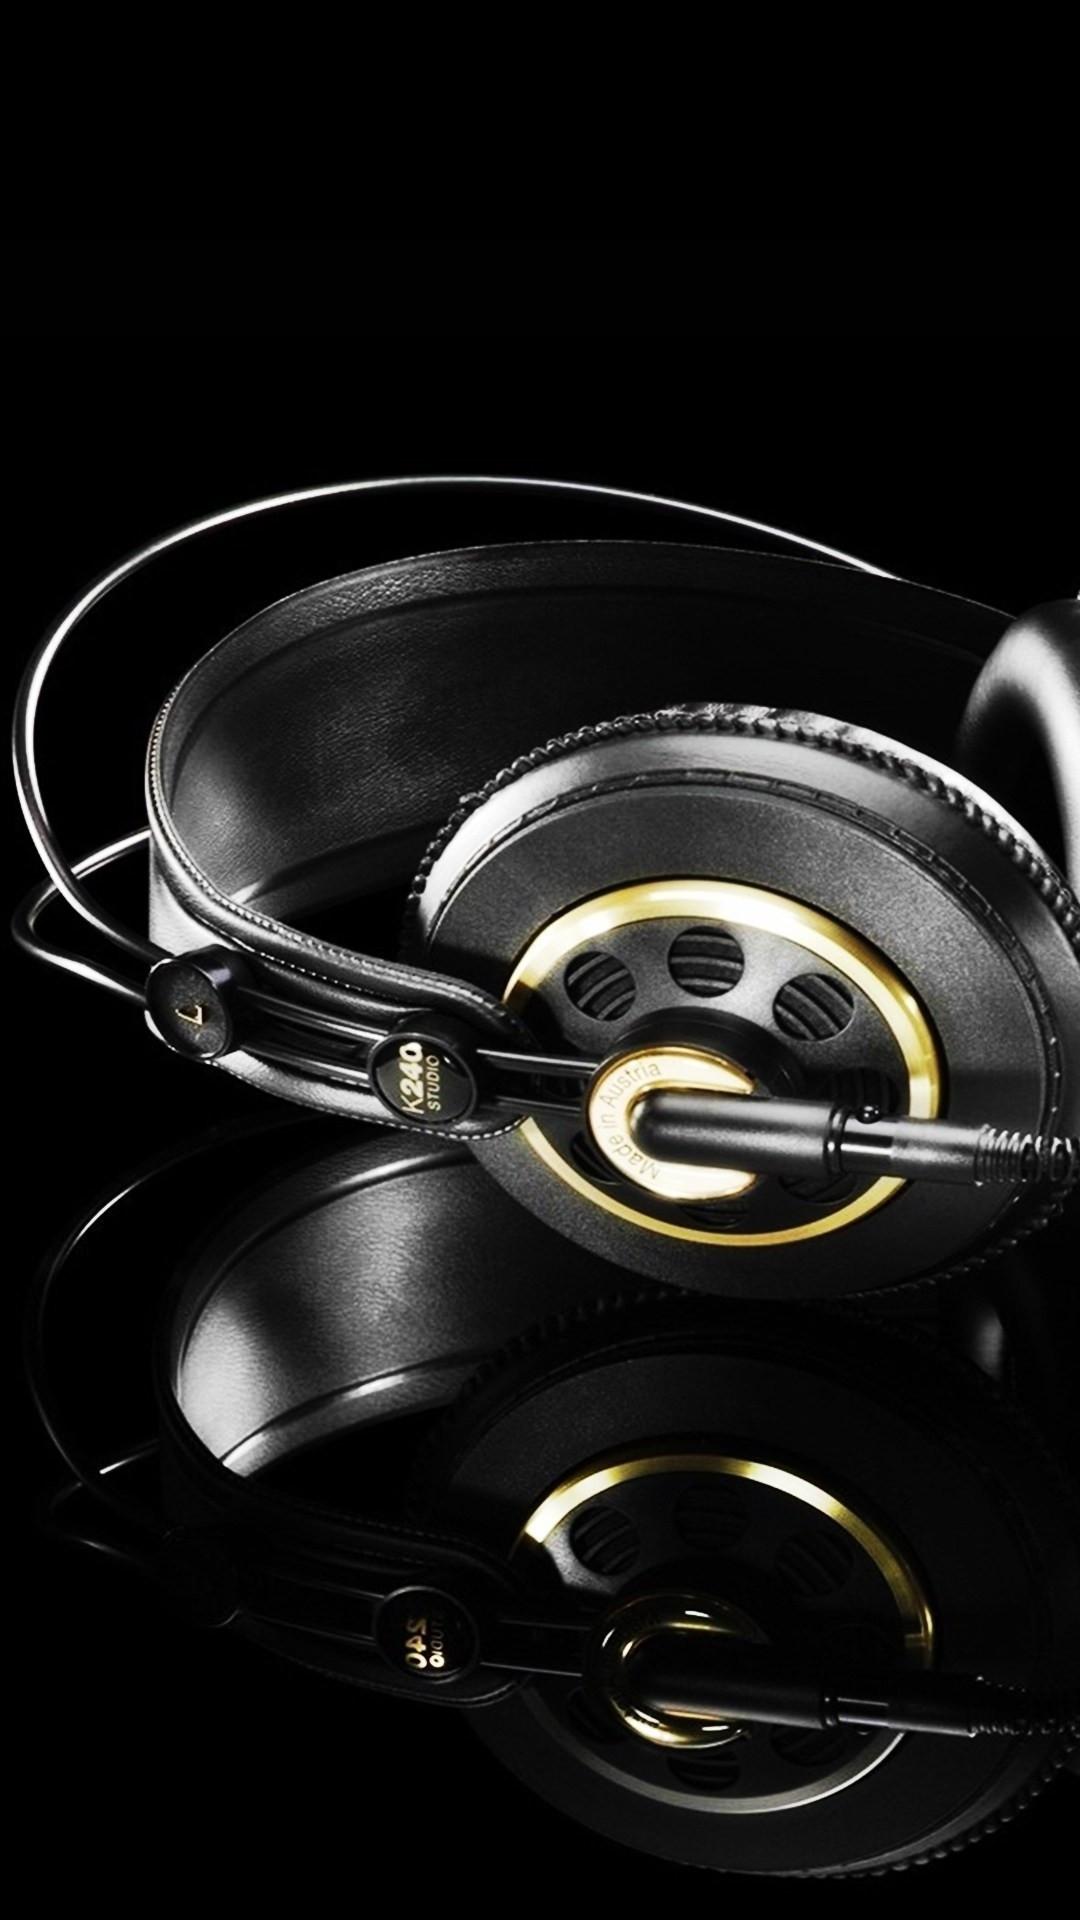 Studio Headphones Black Gold #iPhone #6 #plus #wallpaper